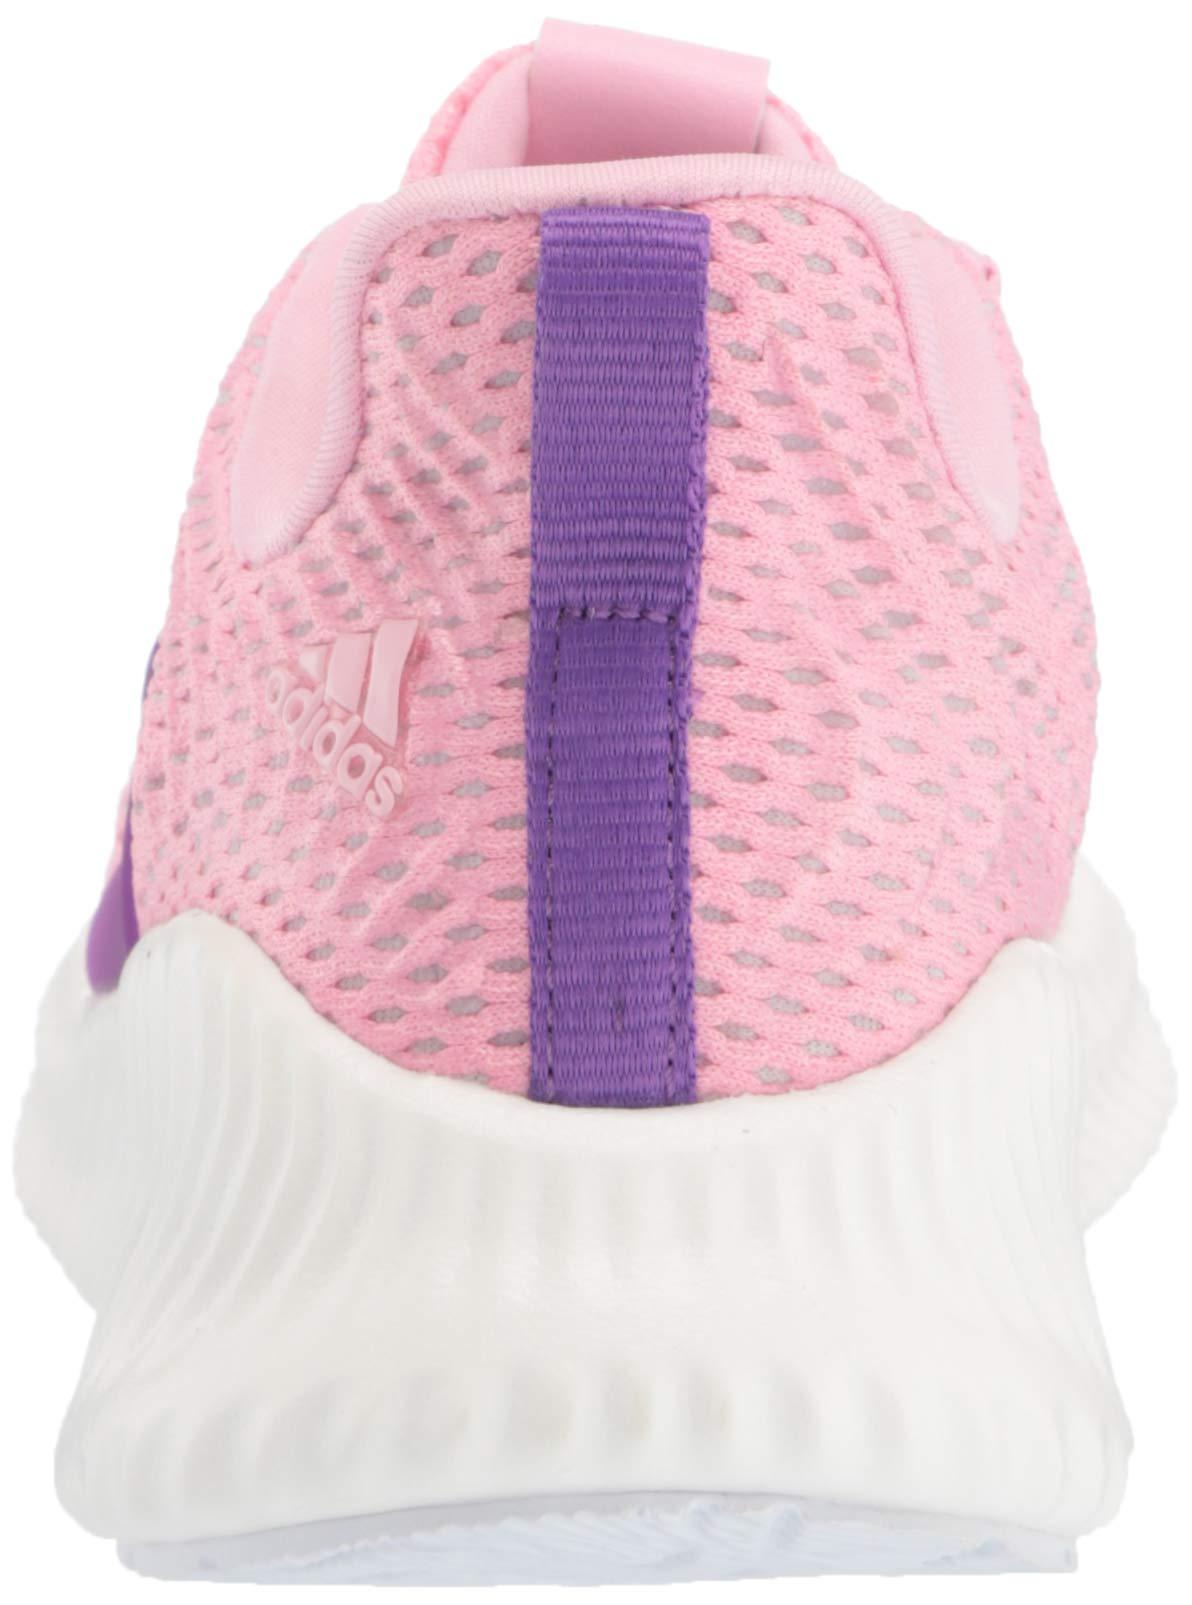 Adidas Kids Alphabounce Instinct, true pink/active purple/cloud white 2.5 M US Little Kid by adidas (Image #2)